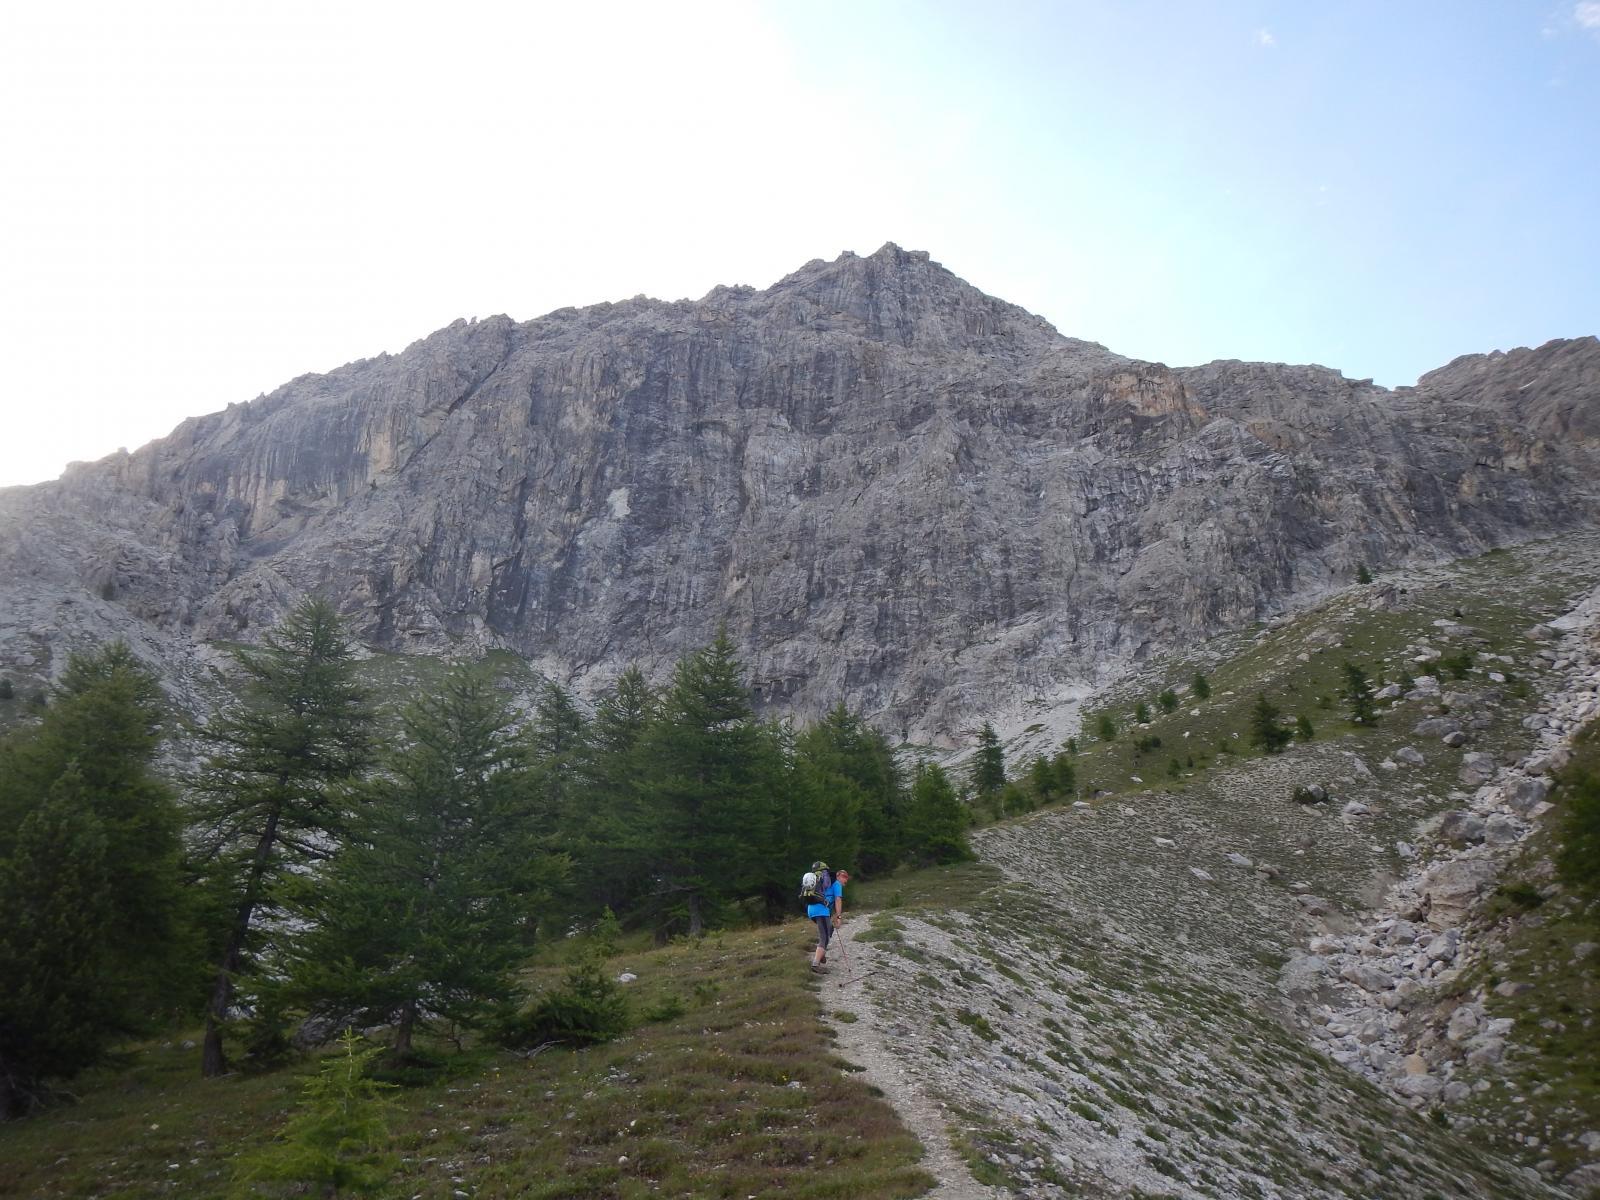 Furgon (Monte) Via del Pilastro 2014-08-07